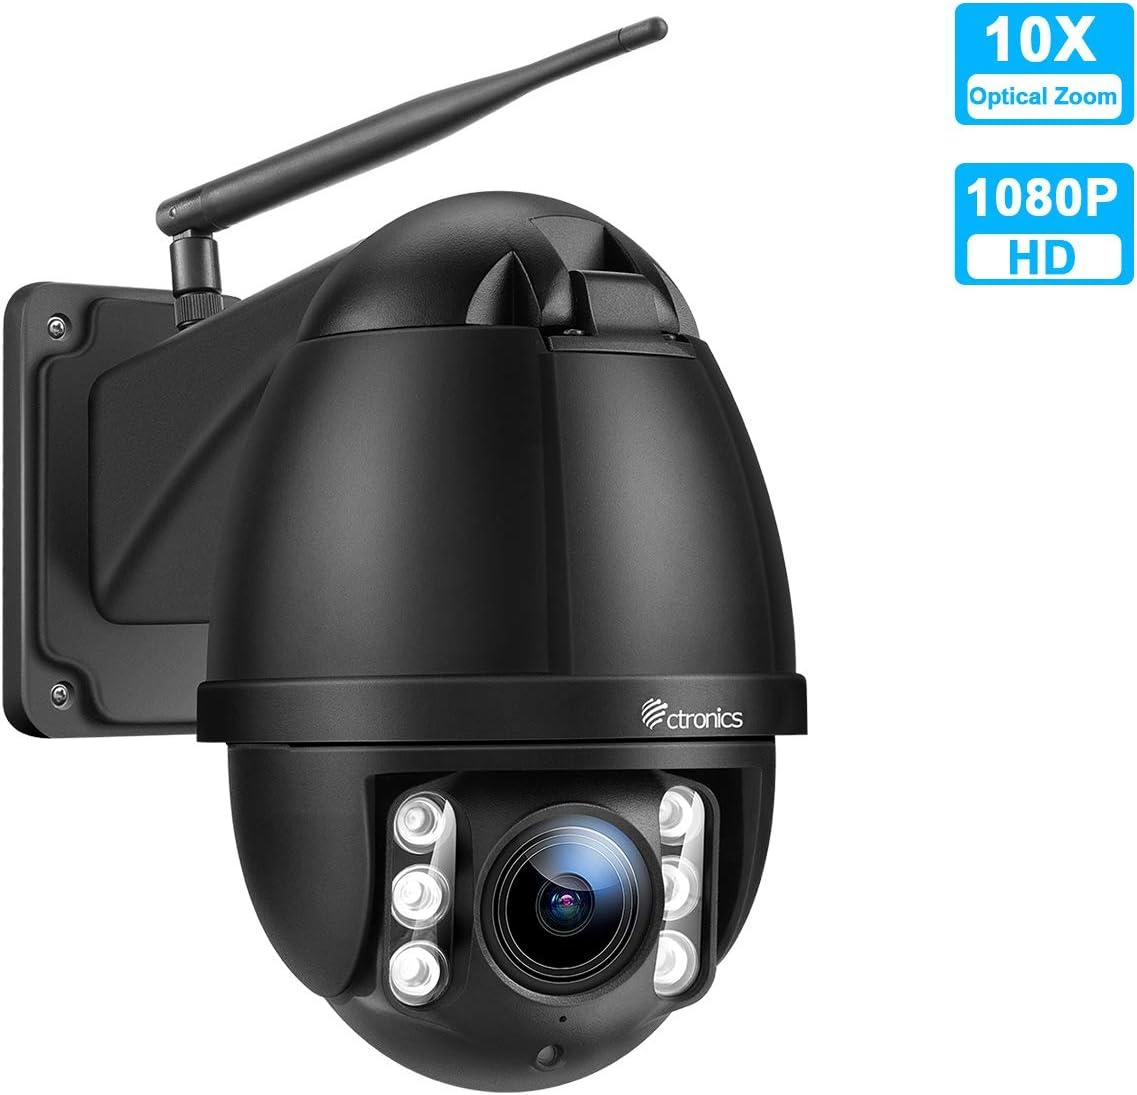 PTZ IP Dome Kamera Aussen Ctronics uuml berwachungskamera